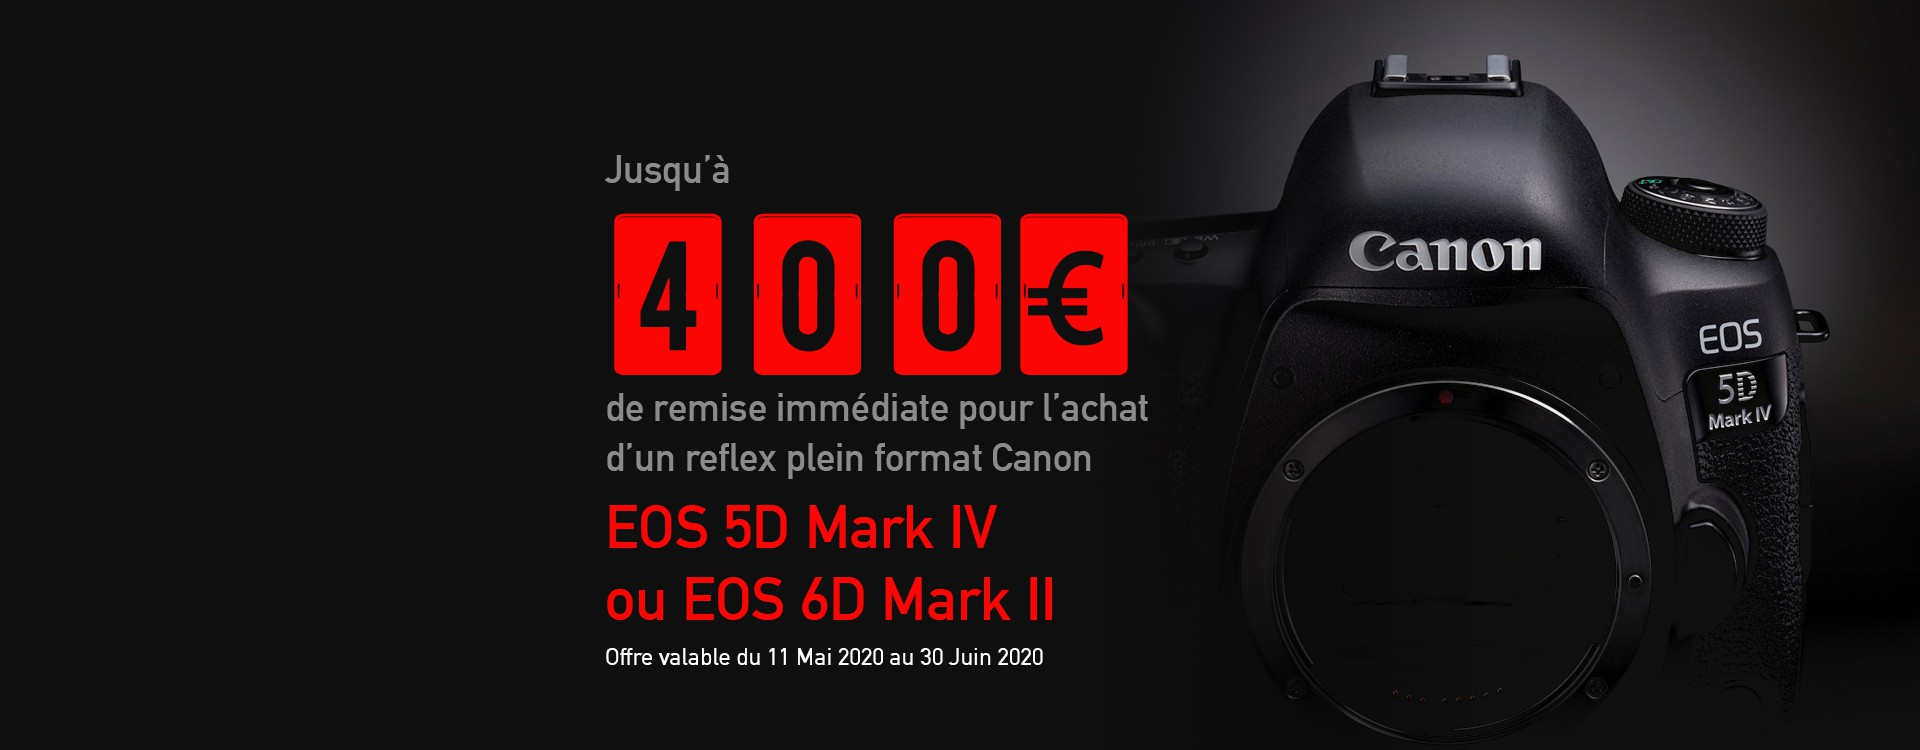 Offre Canon Photo Printemps 2020